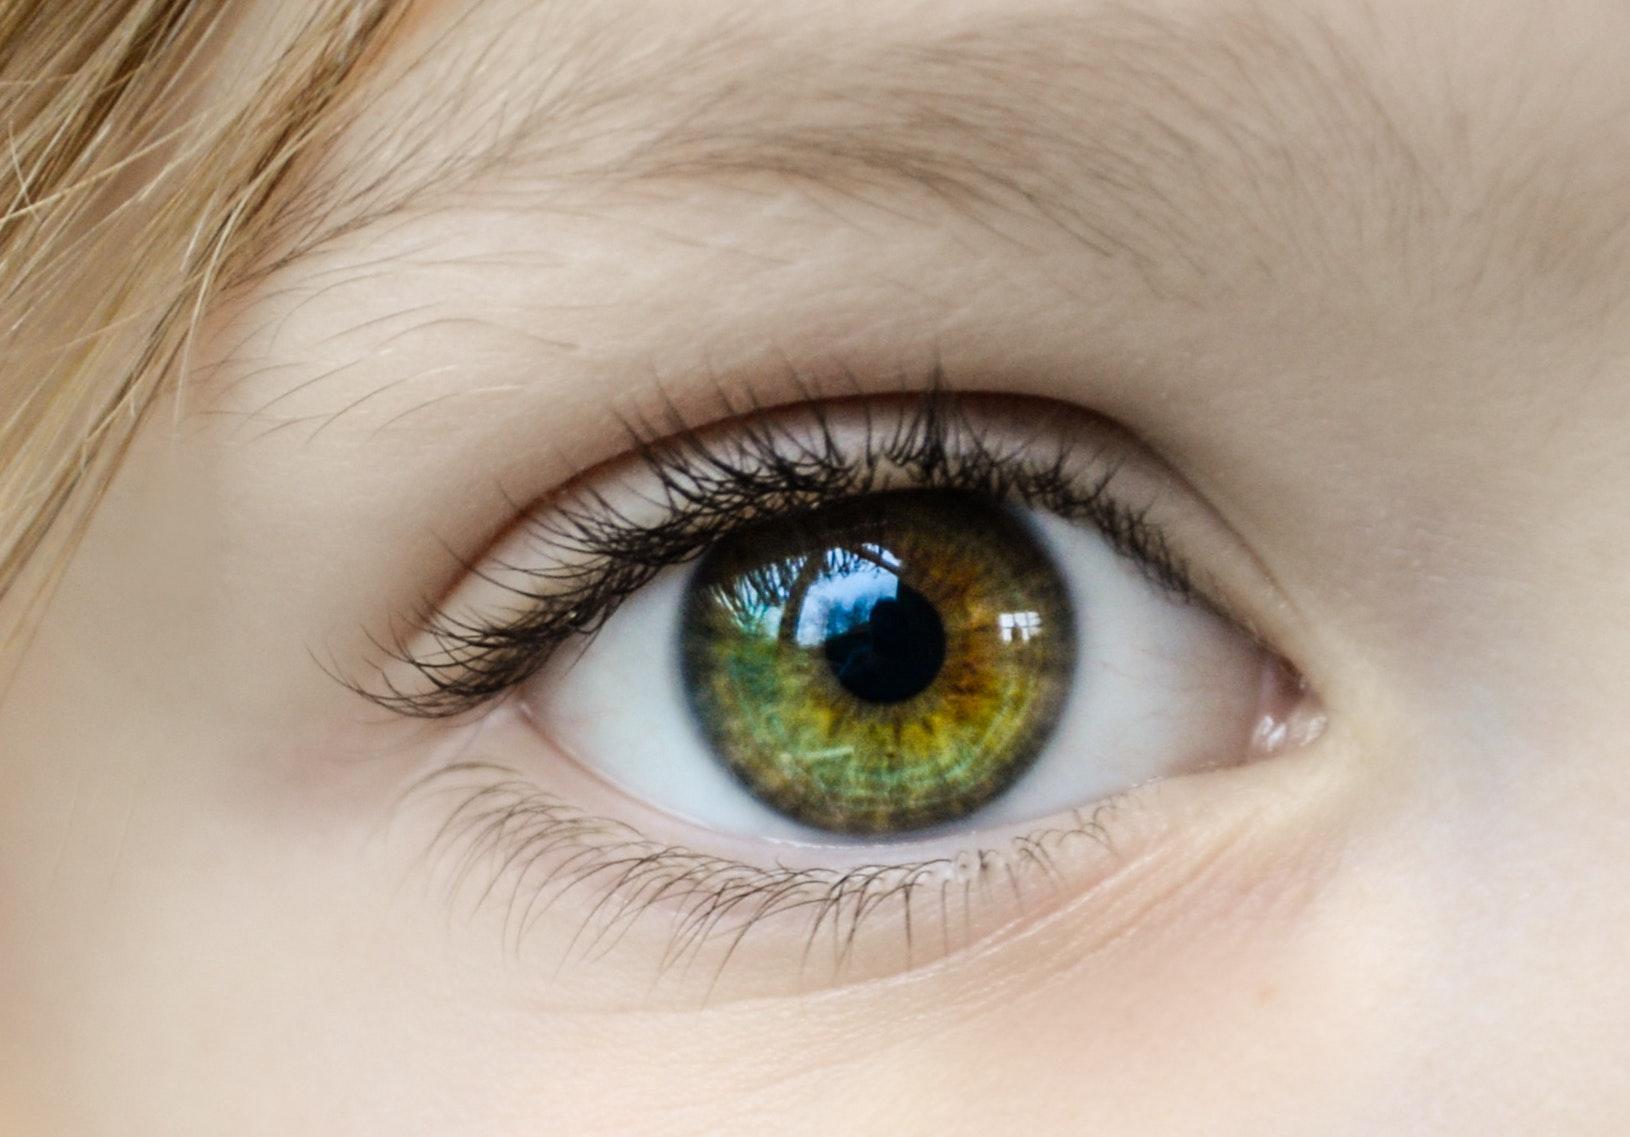 Close up eye ball